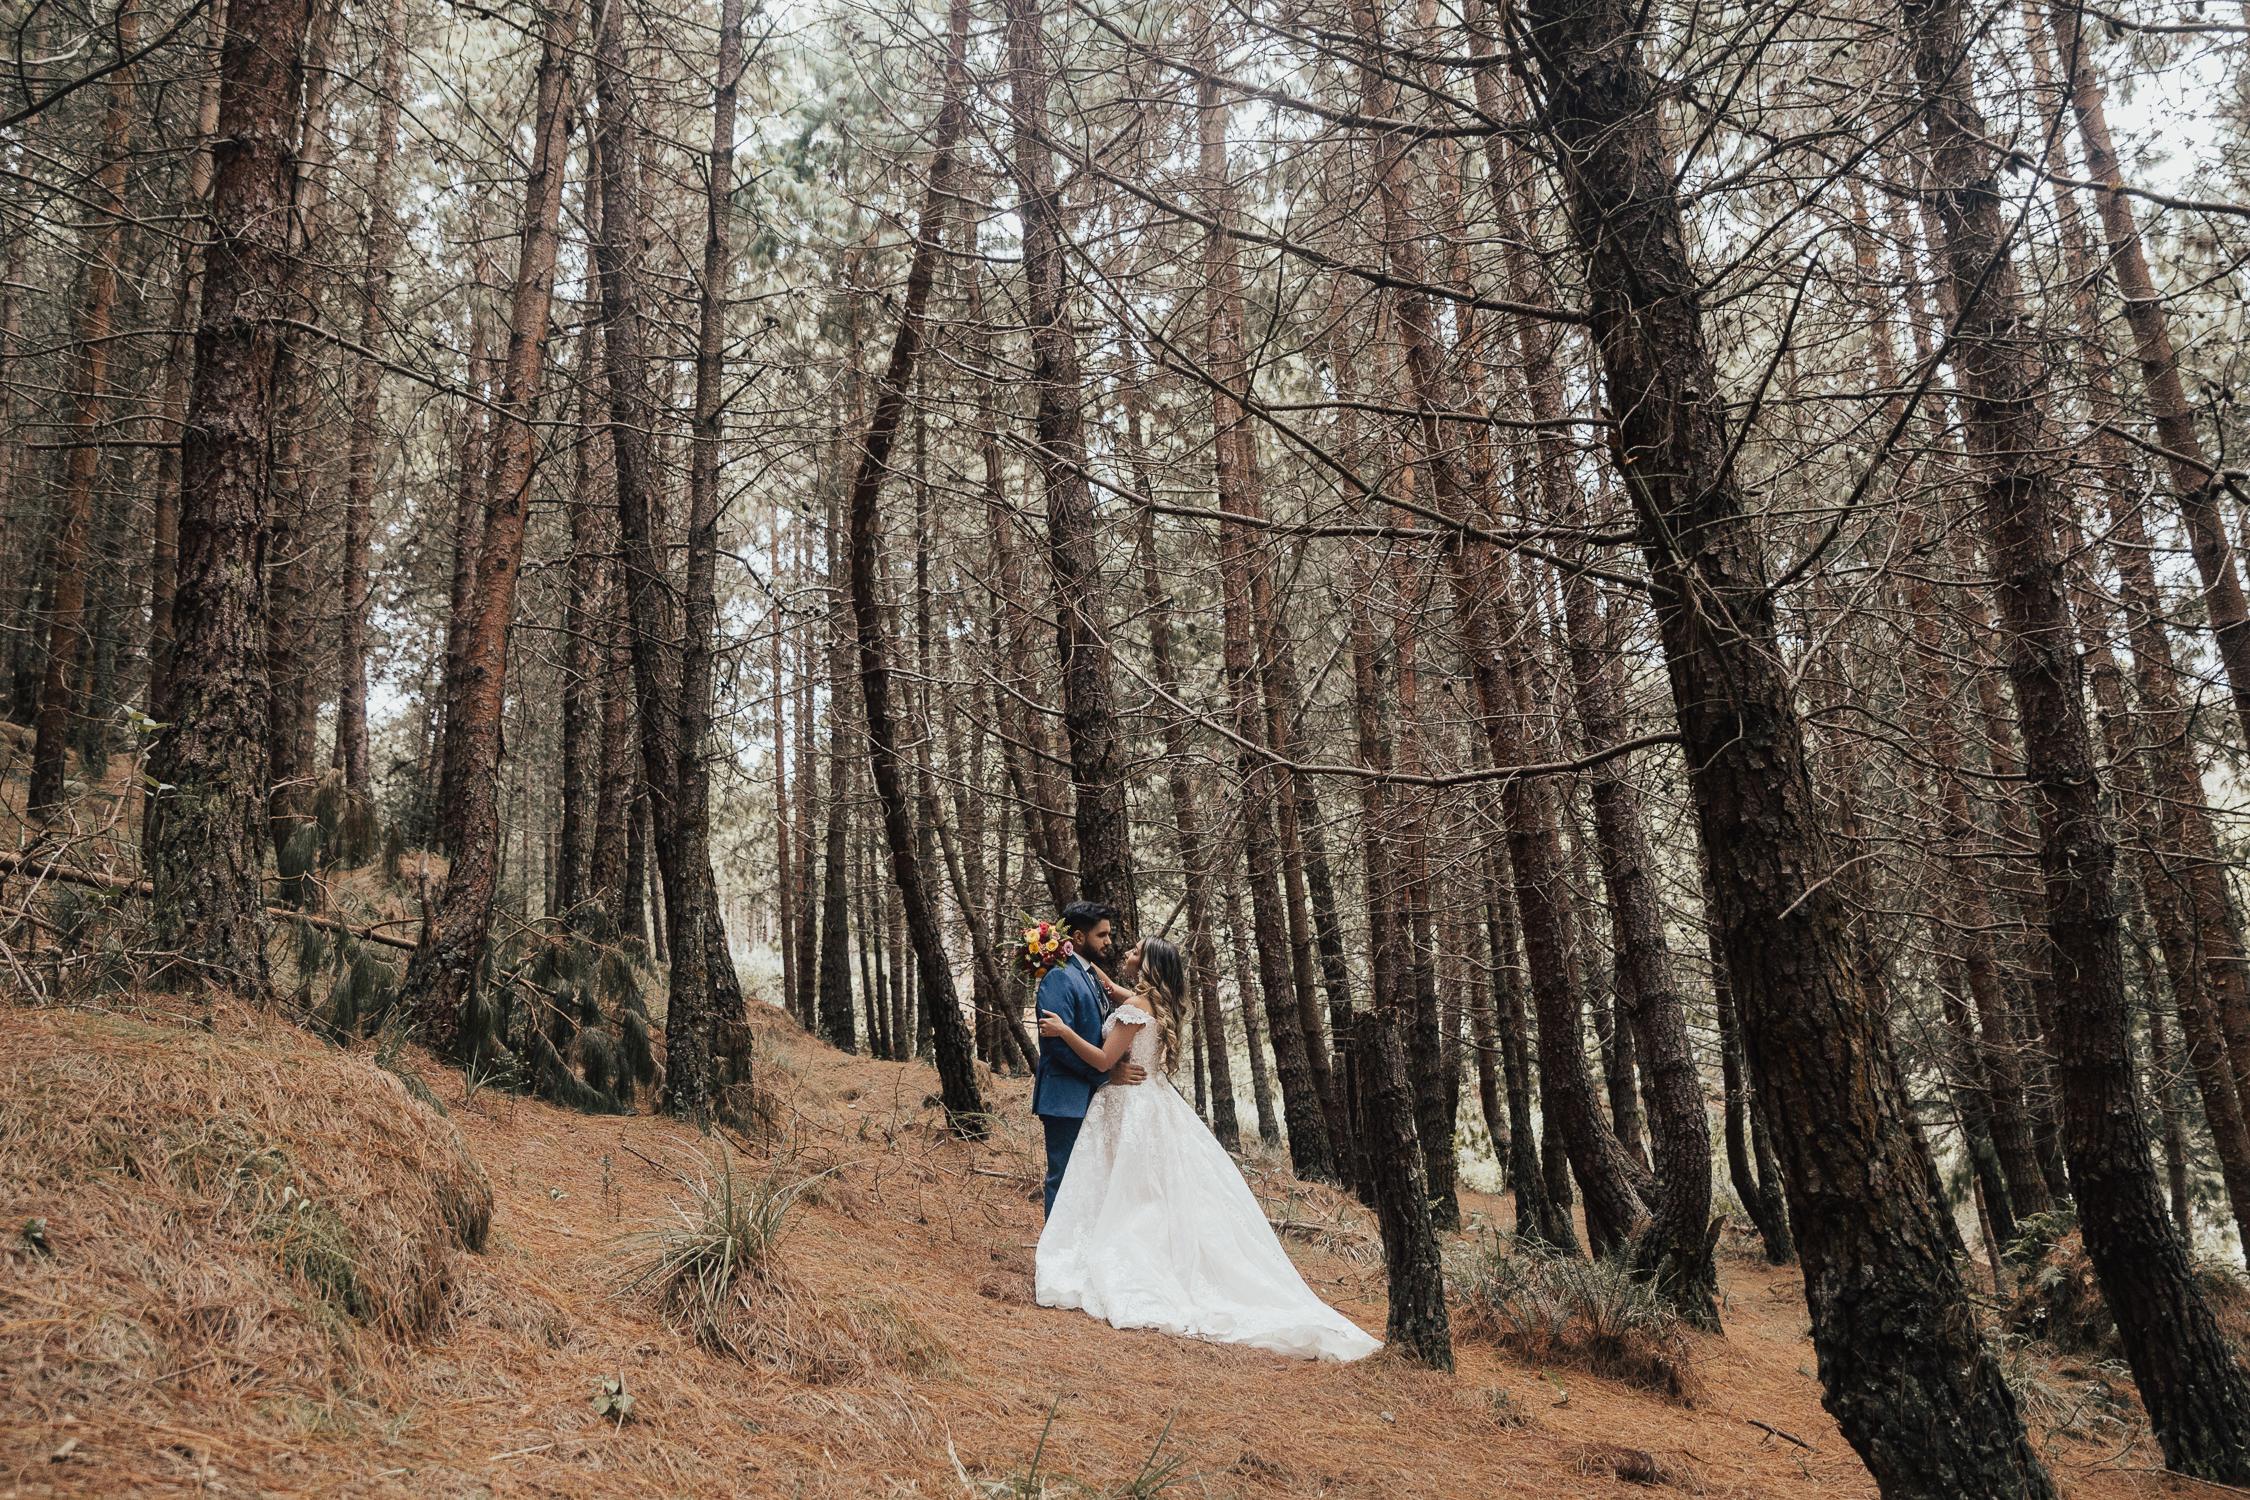 Michelle-Agurto-Fotografia-Bodas-Destination-Wedding-Photographer-Ecuador-Sesion-Johanna-Eduardo-25.JPG